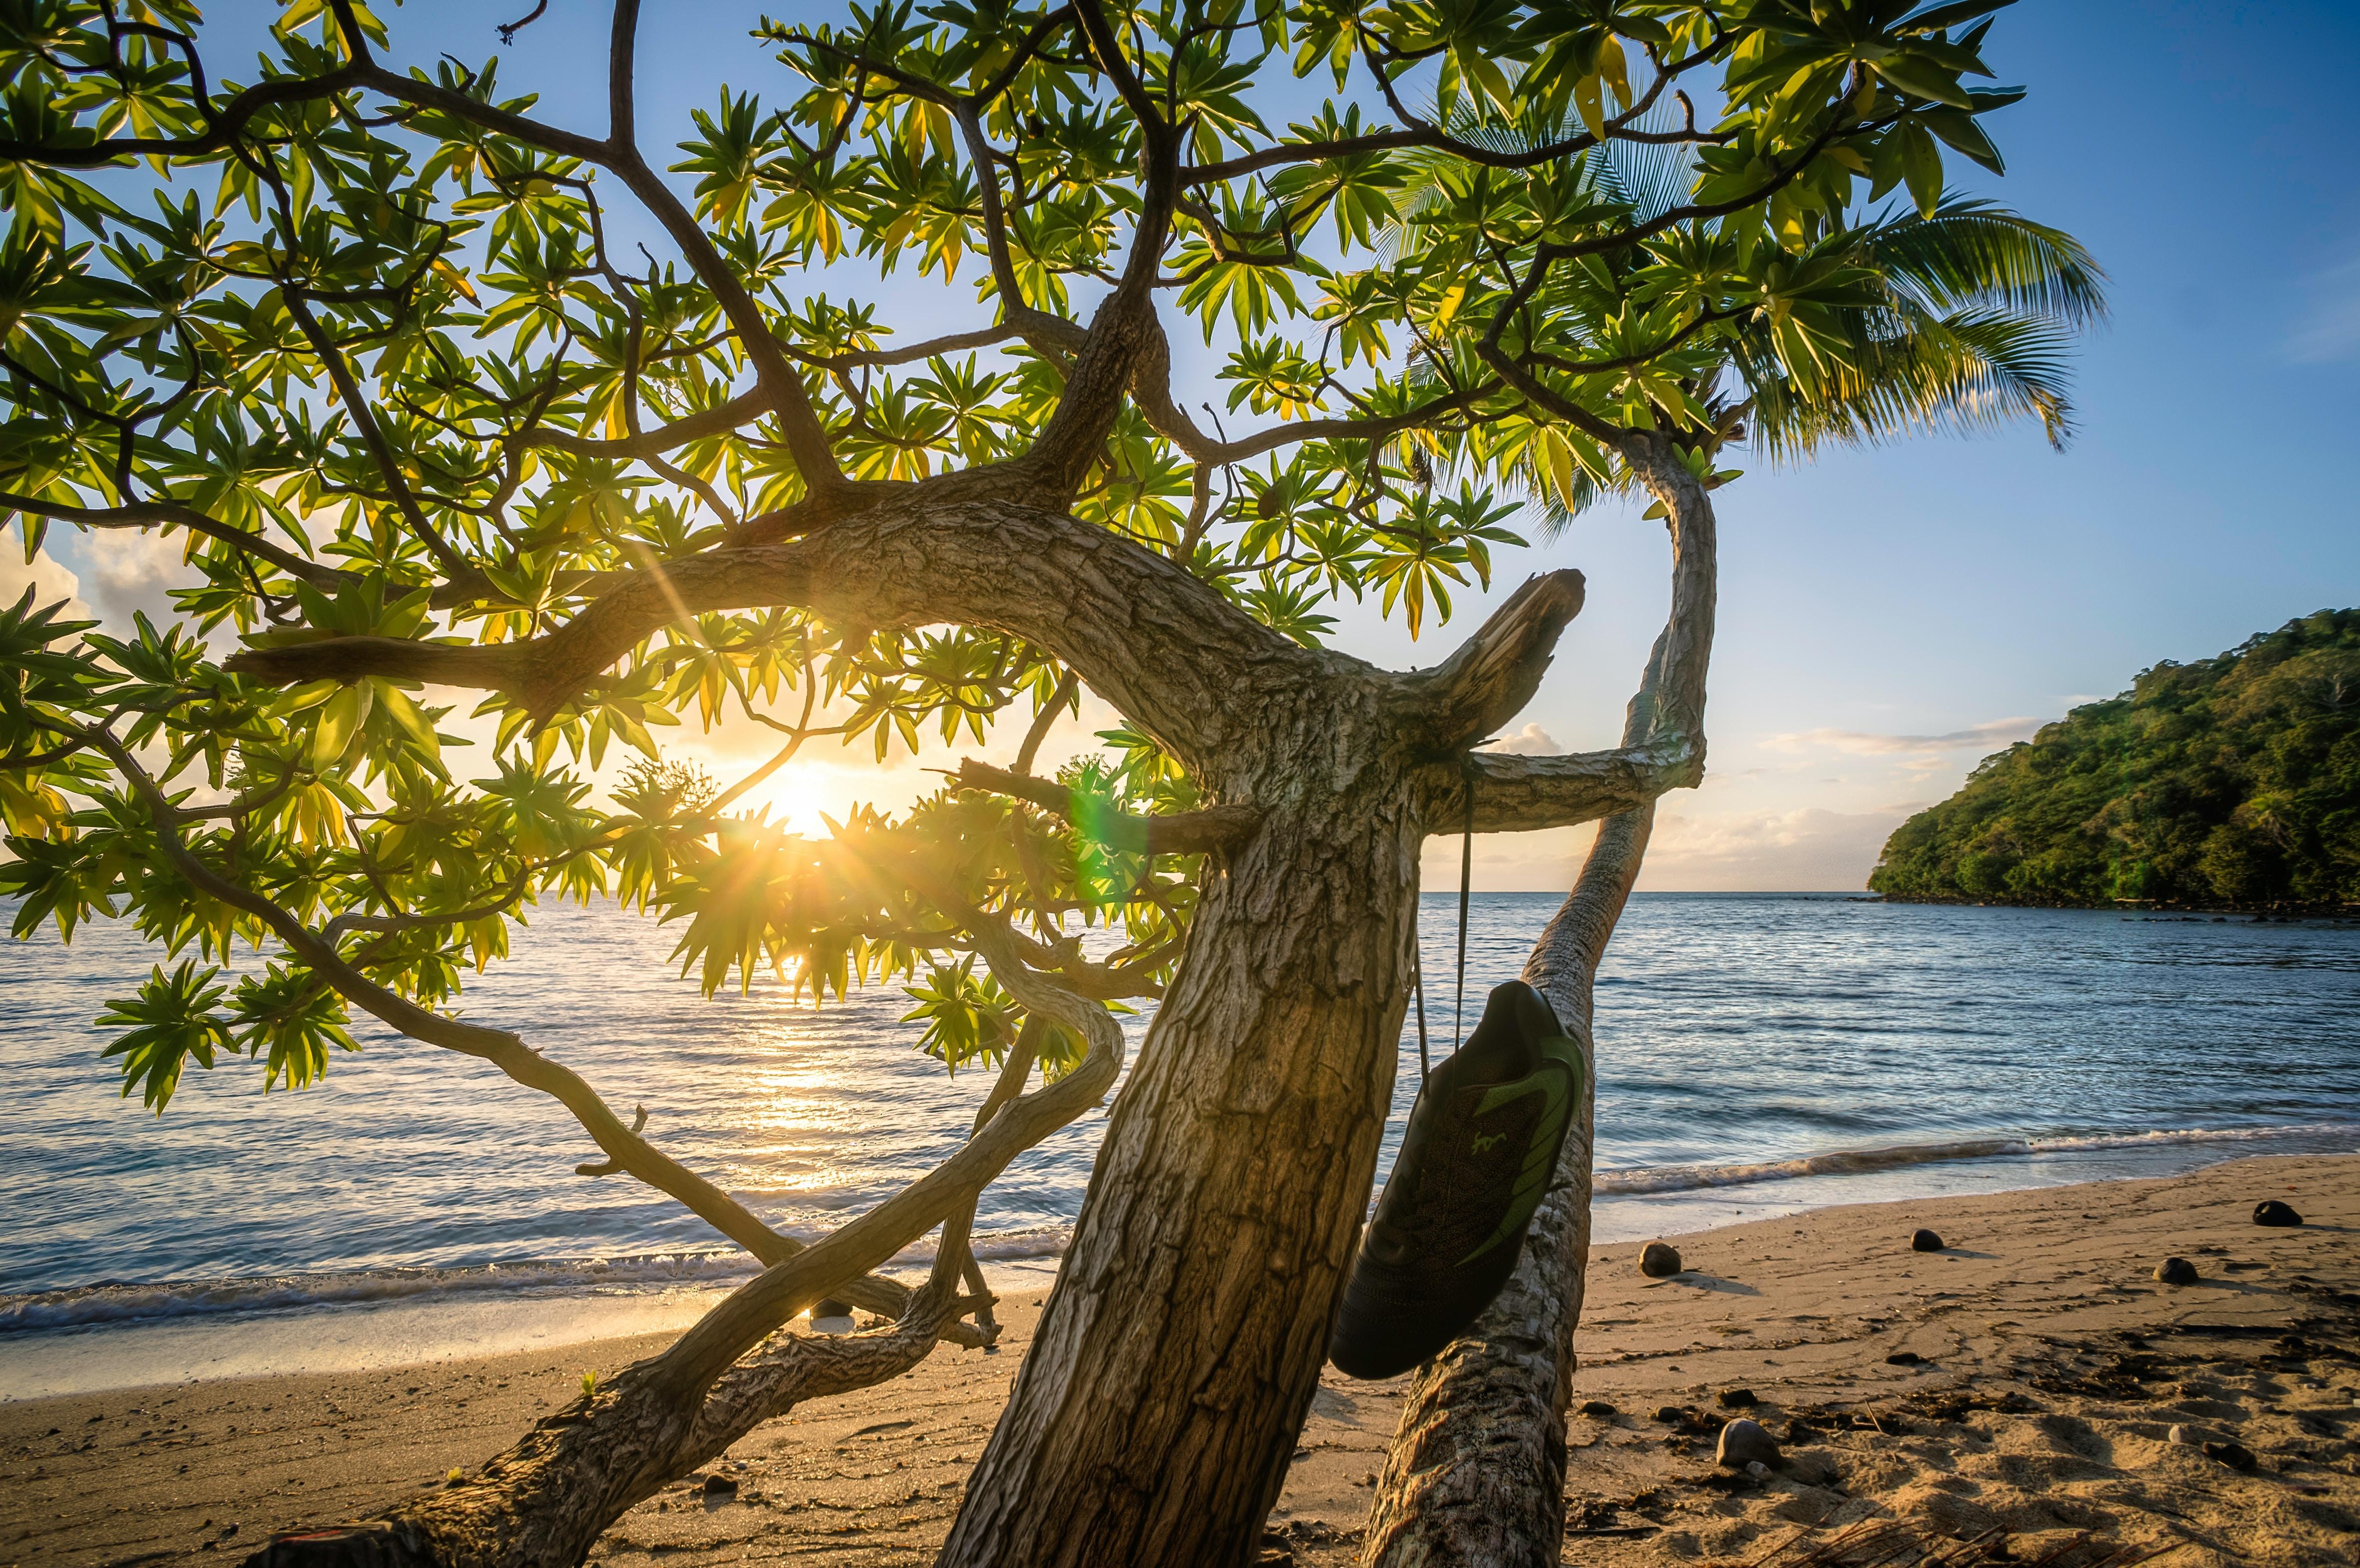 green tree on seashore near beach at daytime